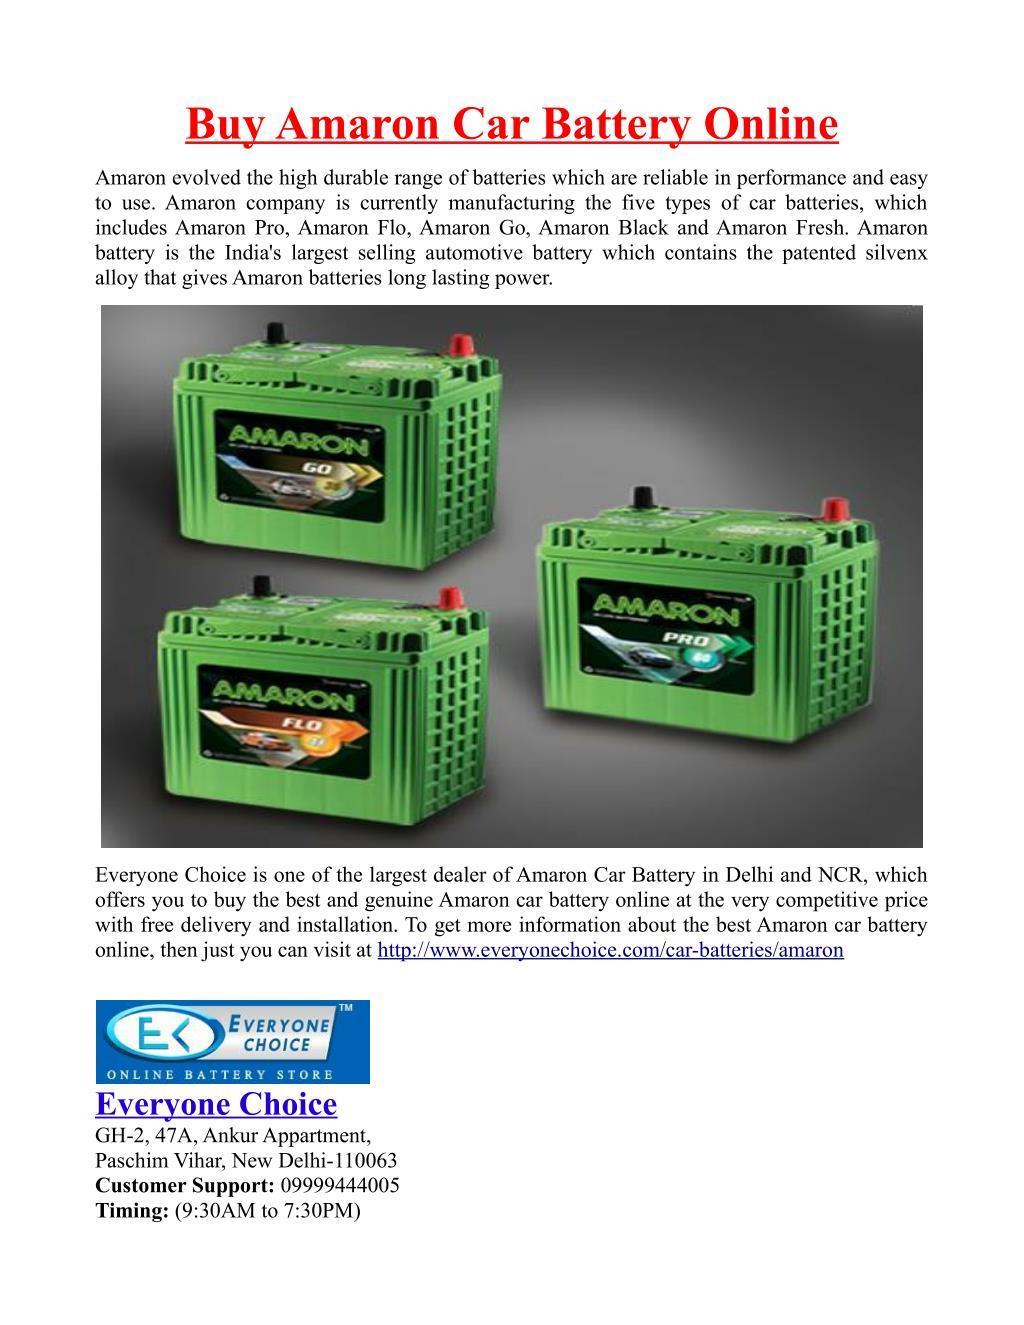 Ppt Buy Amaron Car Battery Online Powerpoint Presentation Id 7286914